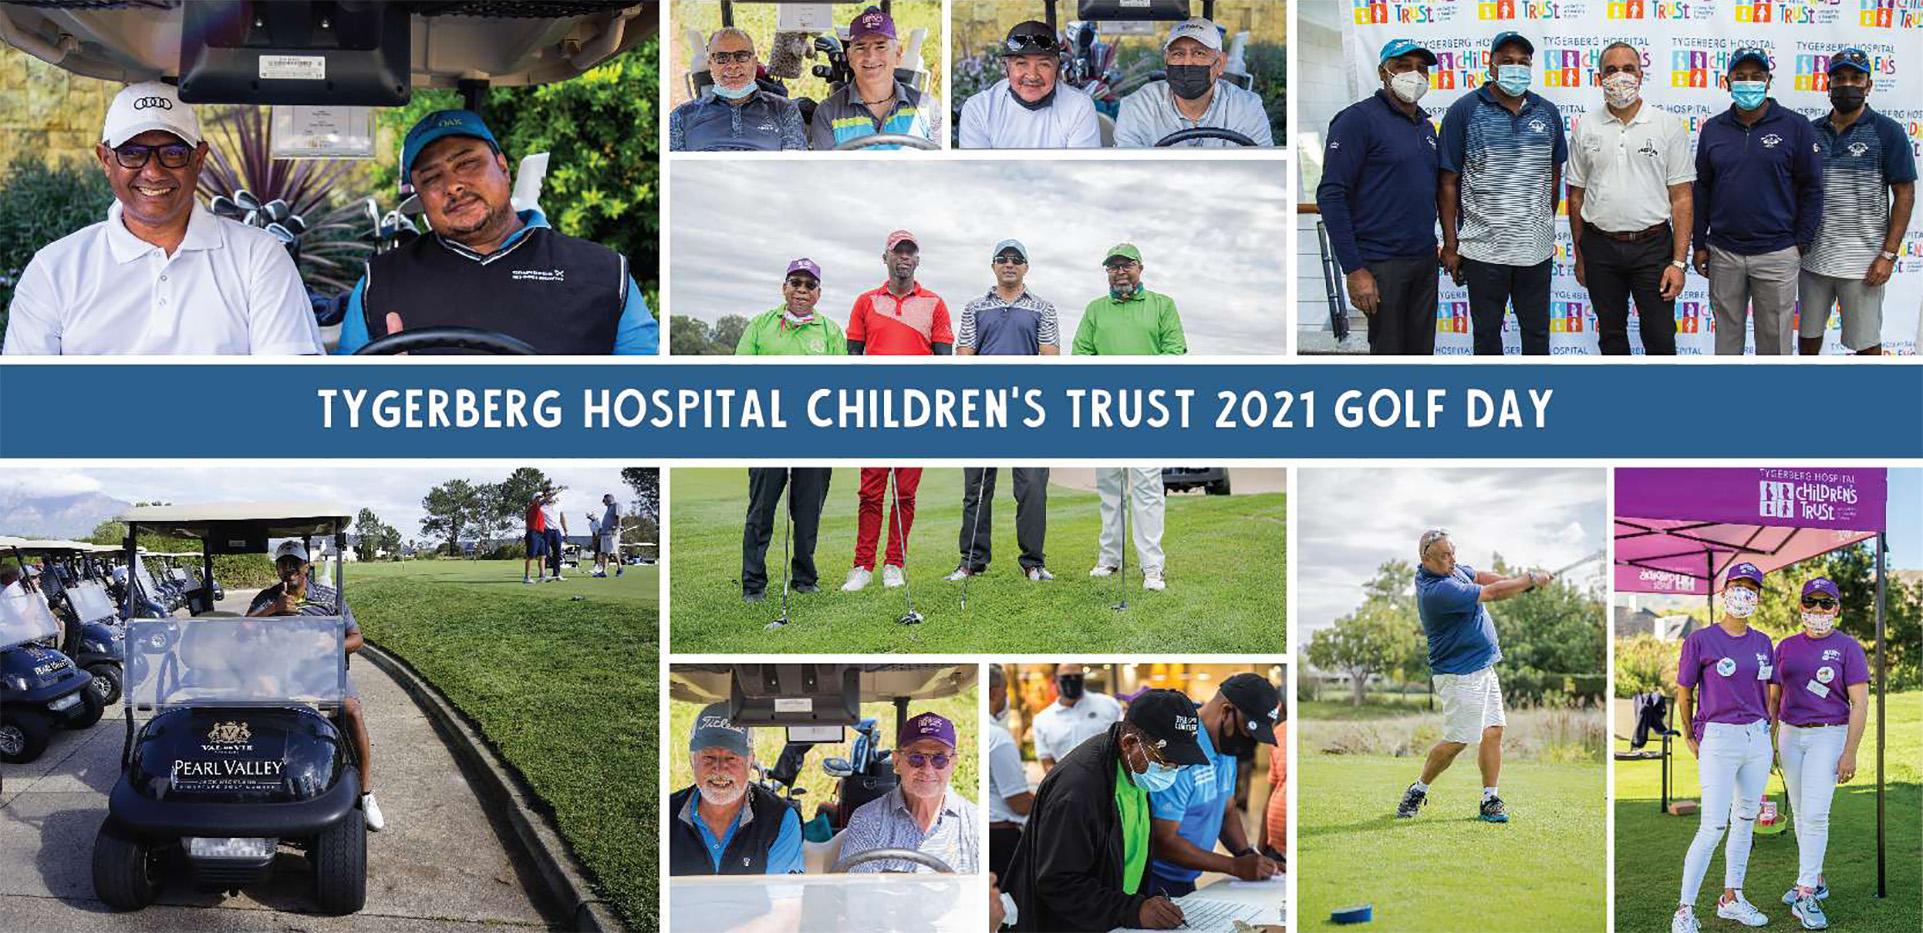 THCT Golf Day Cover jpg